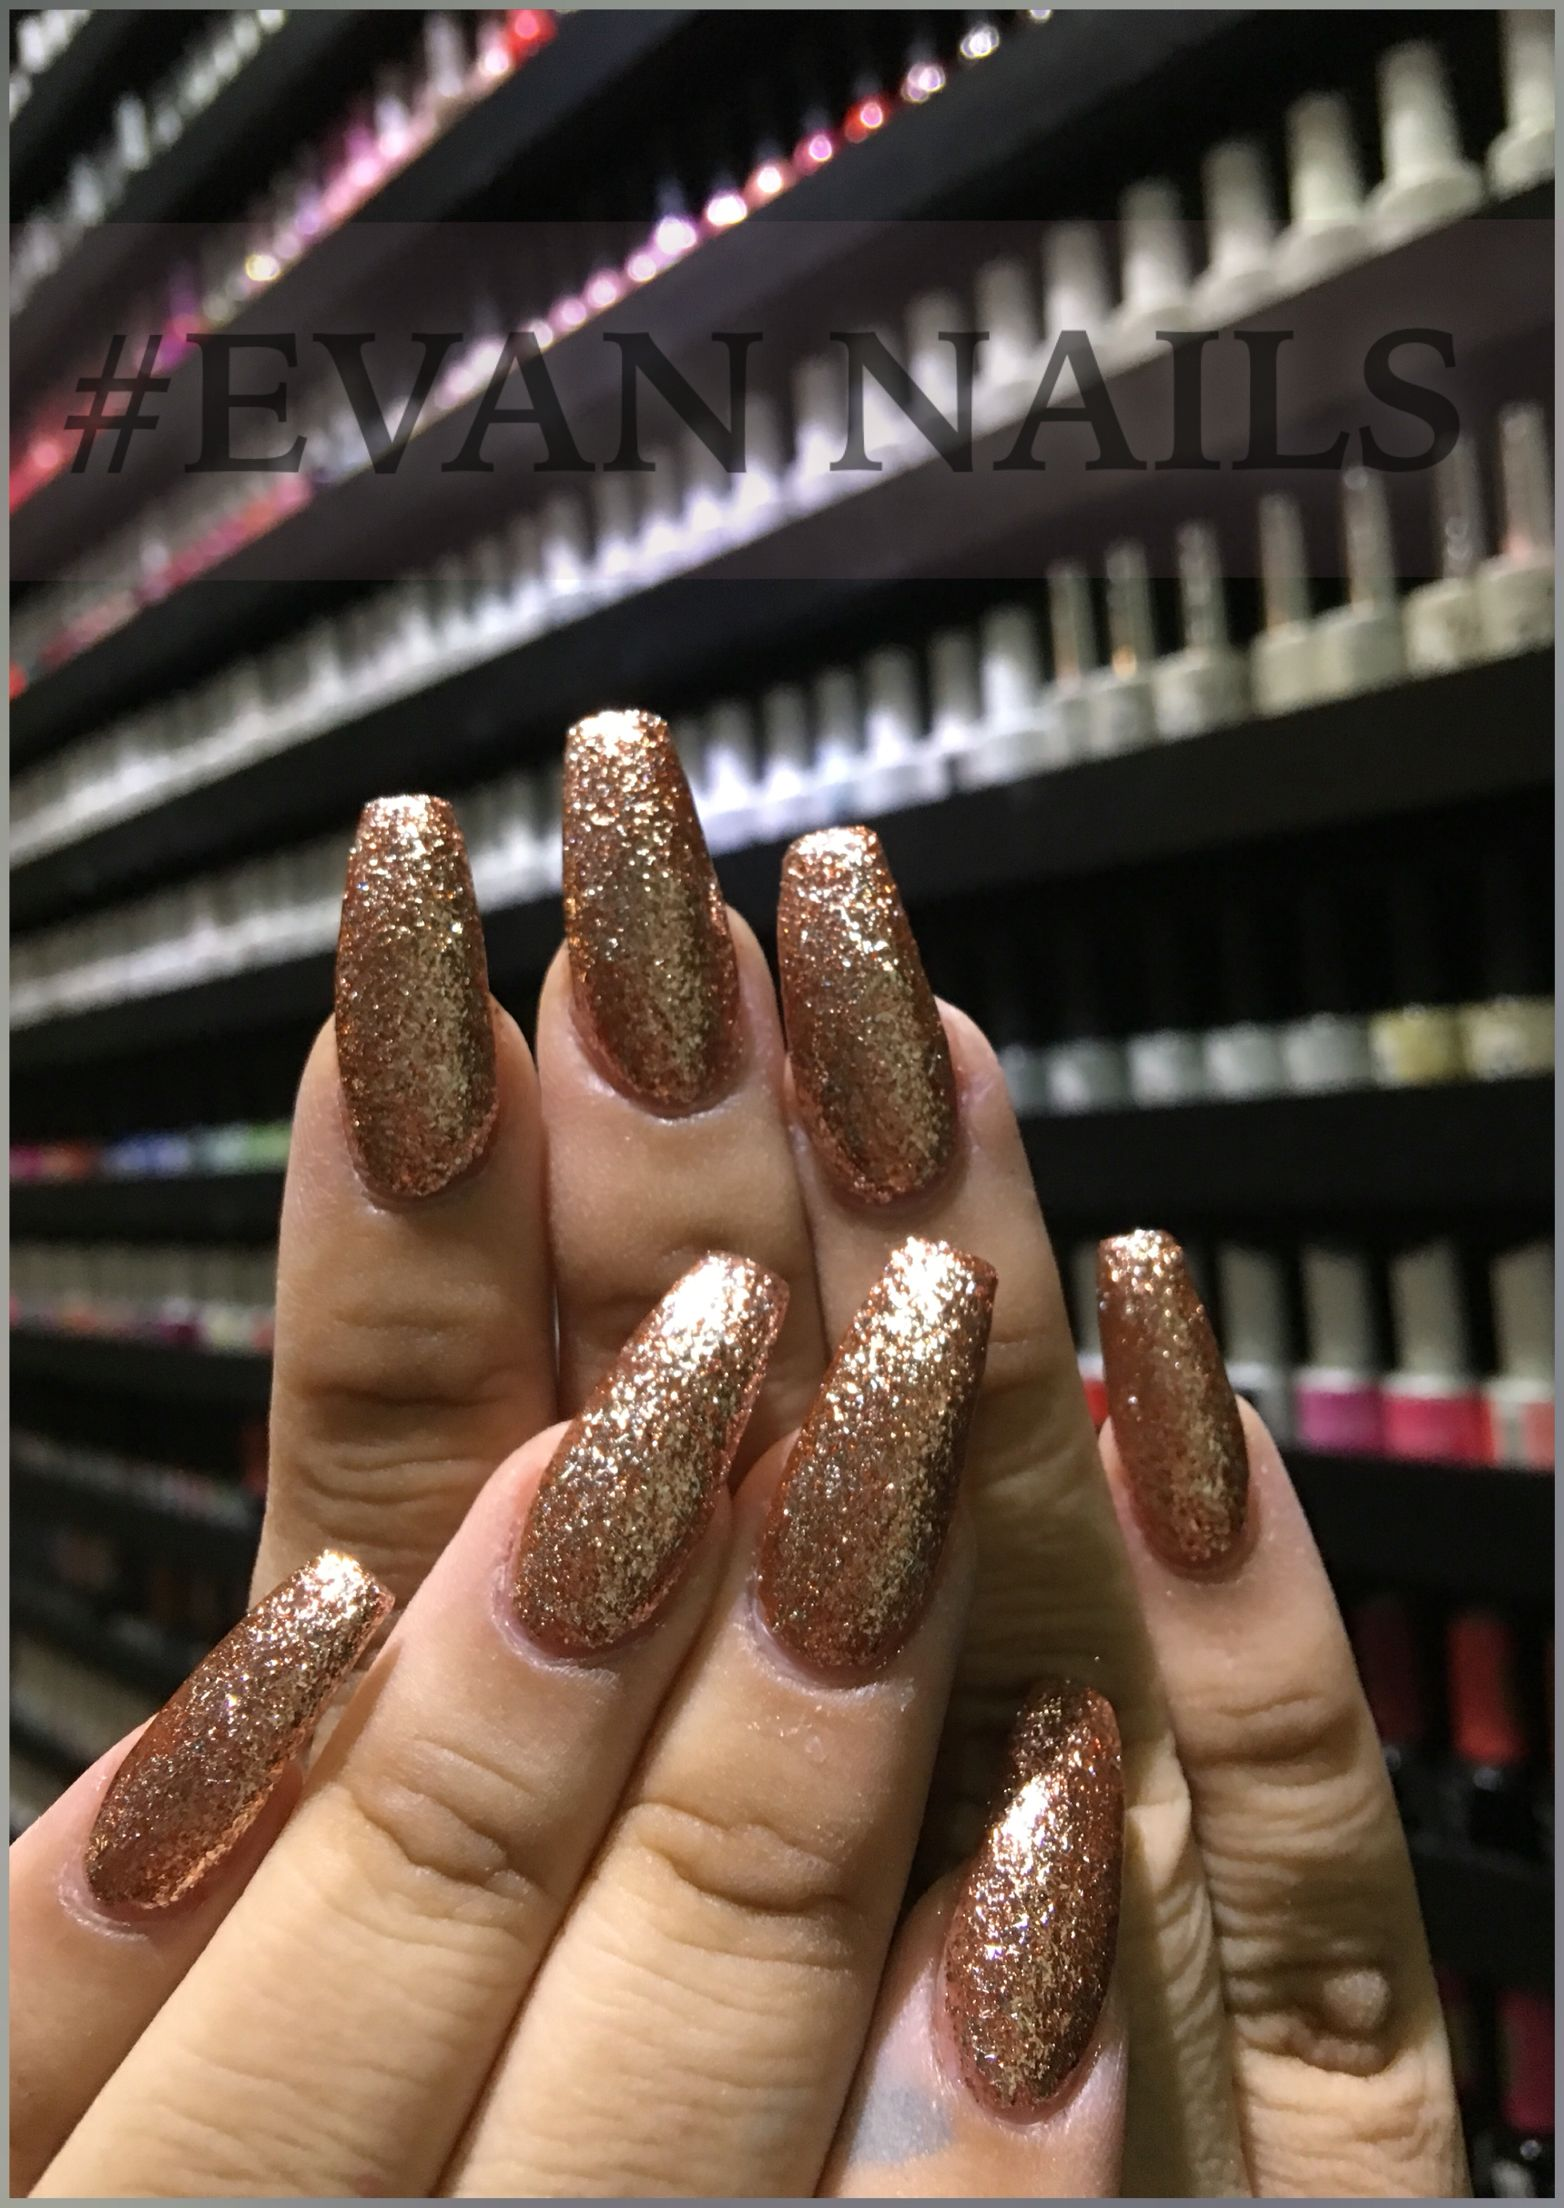 Evan Nails 2751 Gessner Rd Houston, TX 77080 713 895 8277 #nails ...